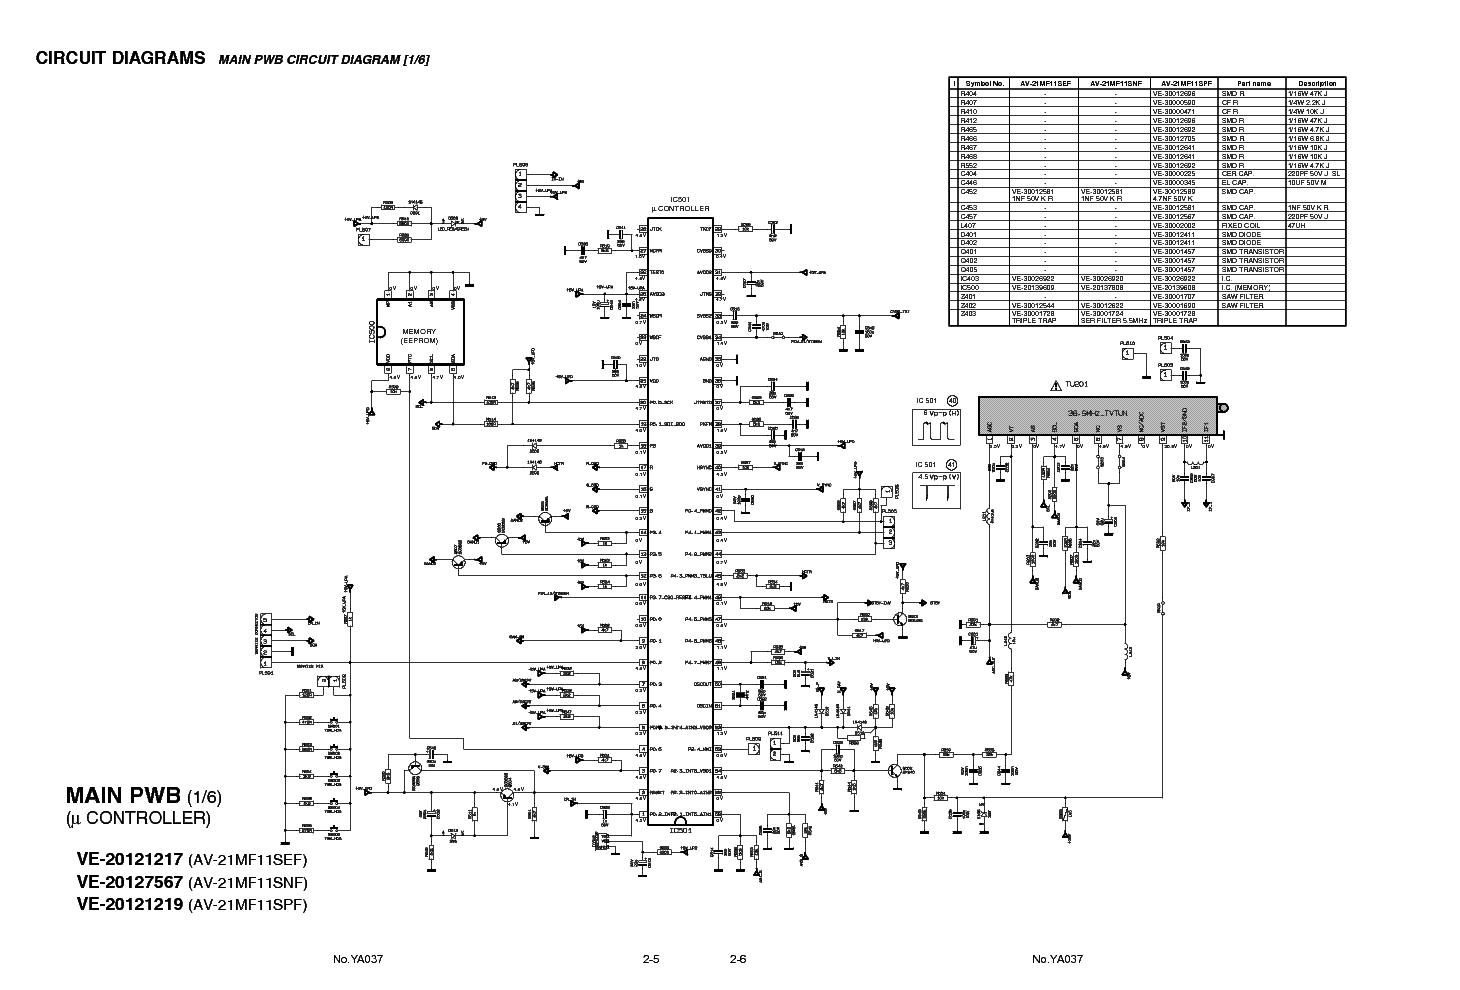 Jvc Tv Av28bt7e Service Manual Free Download  Schematics  Eeprom  Repair Info For Electronics